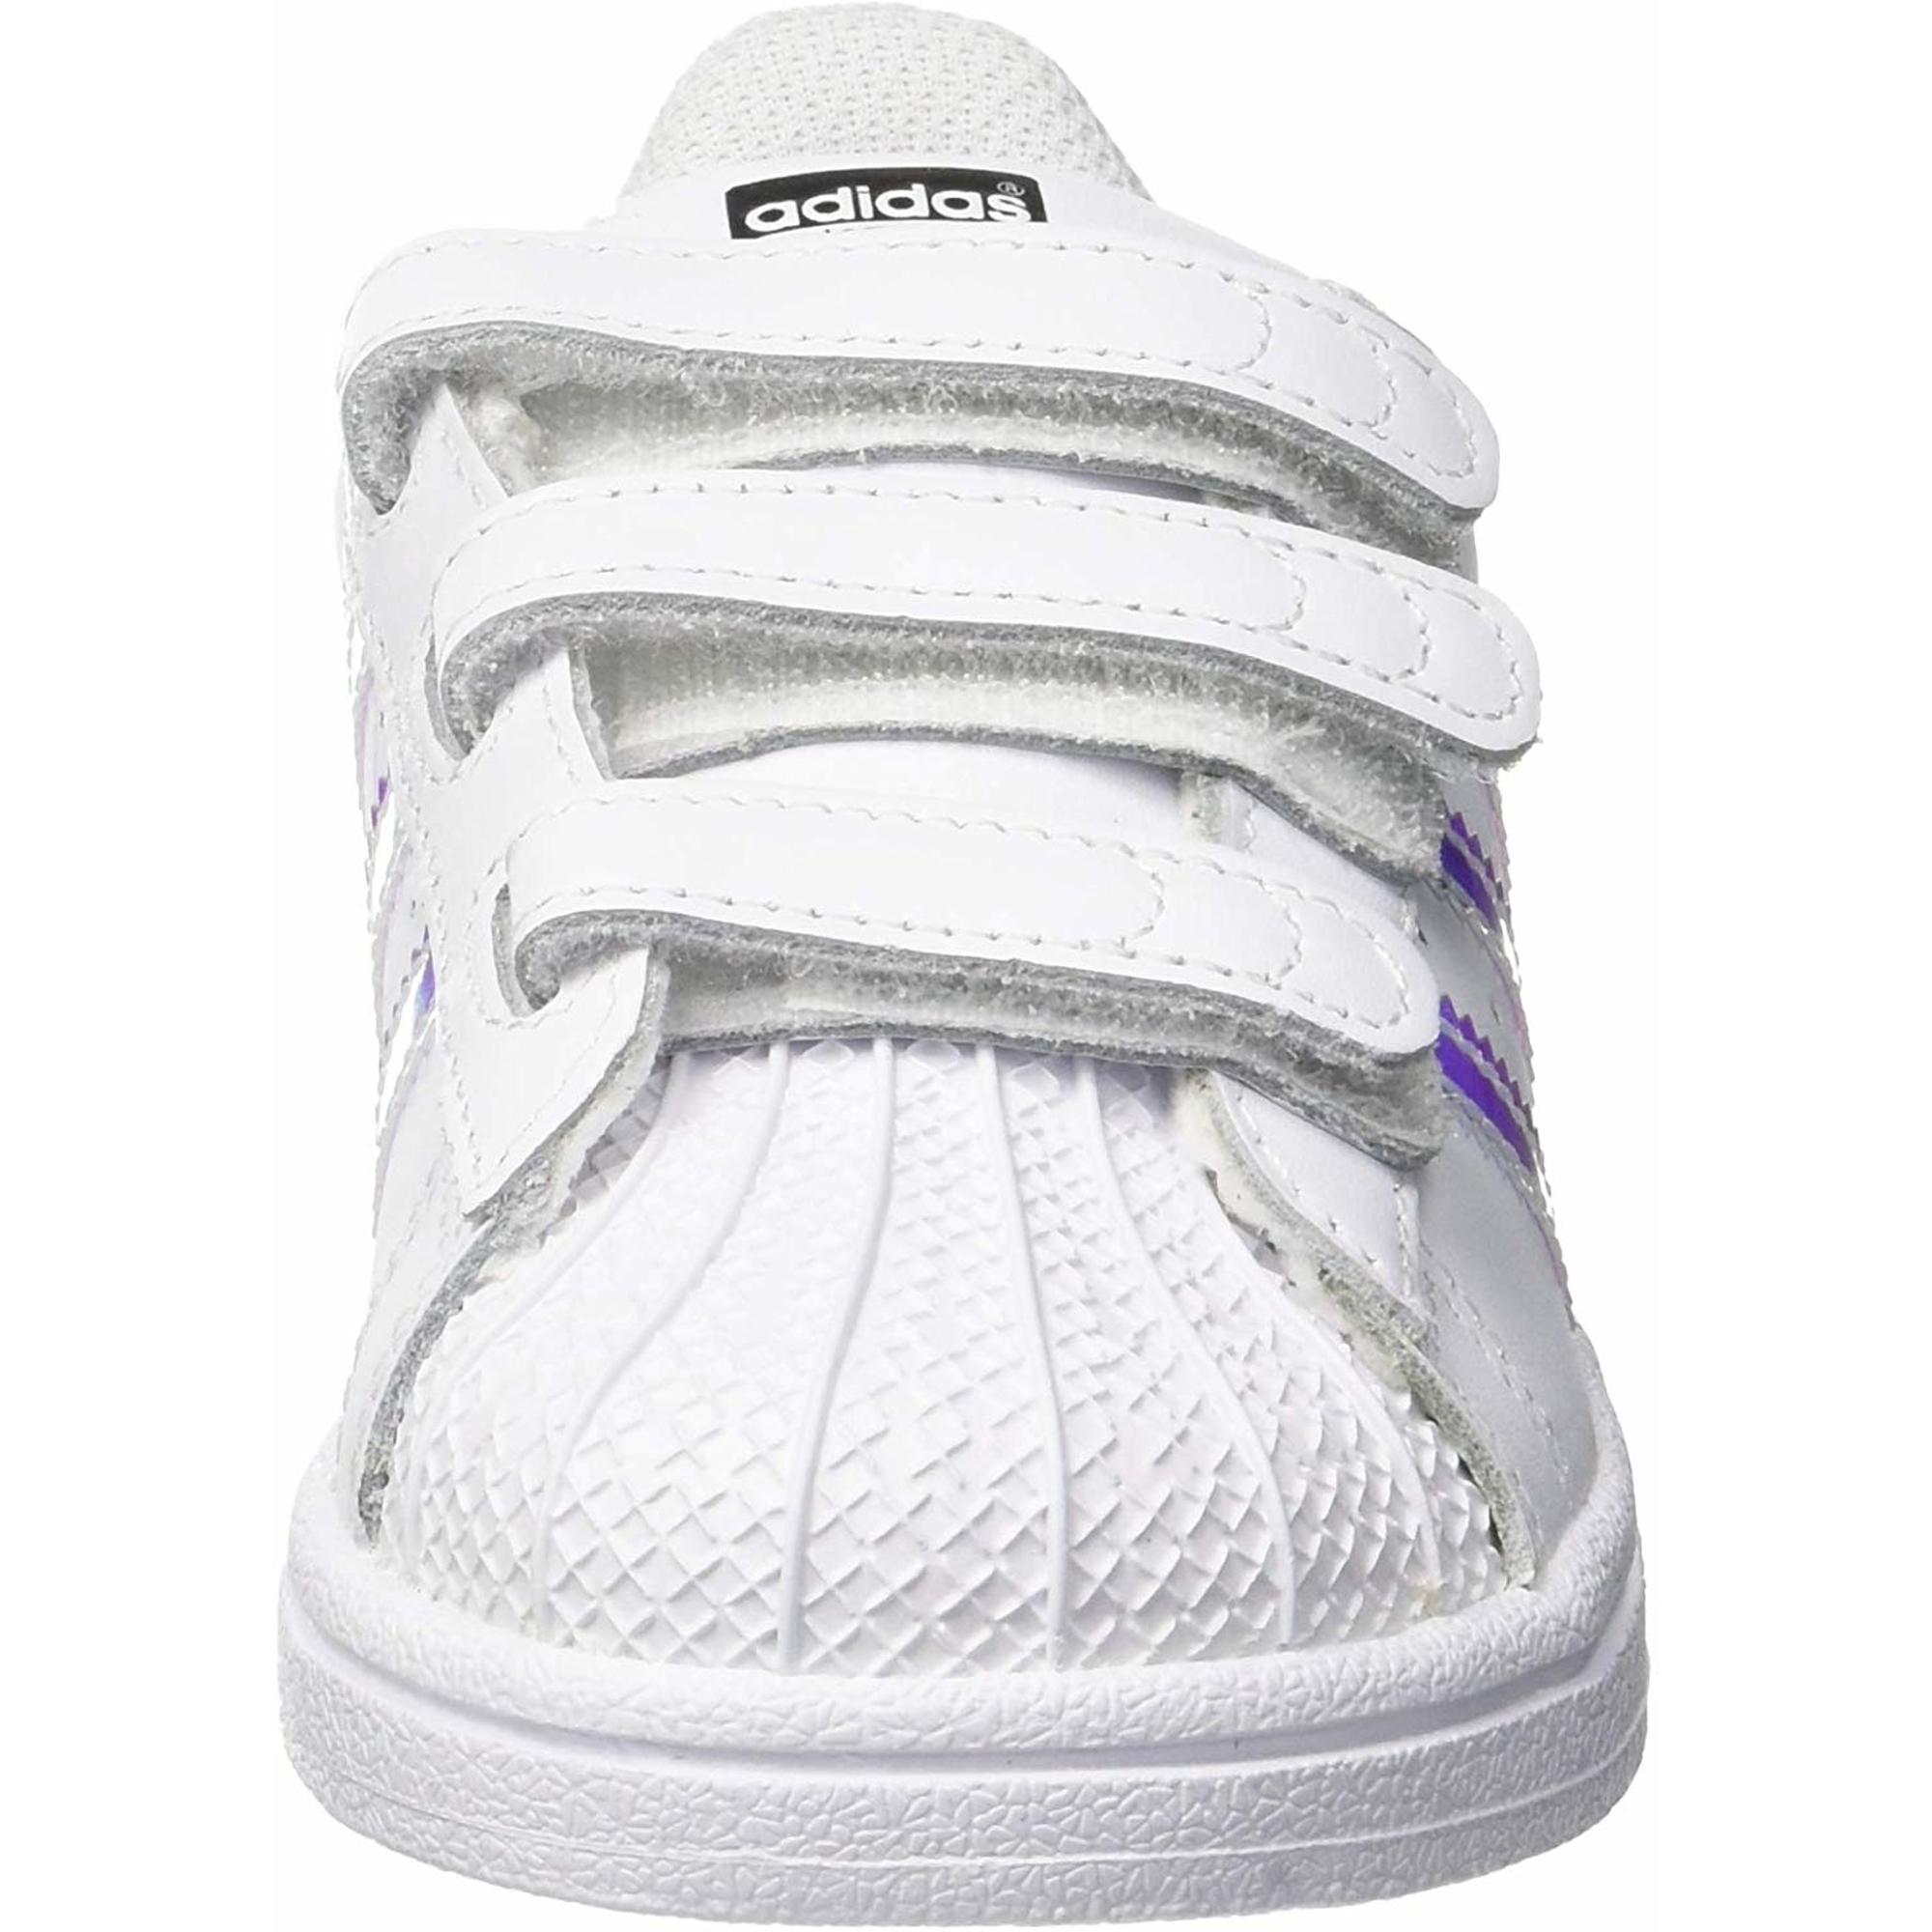 adidas Originals Superstar CF I White/Iridescent Leather Infant